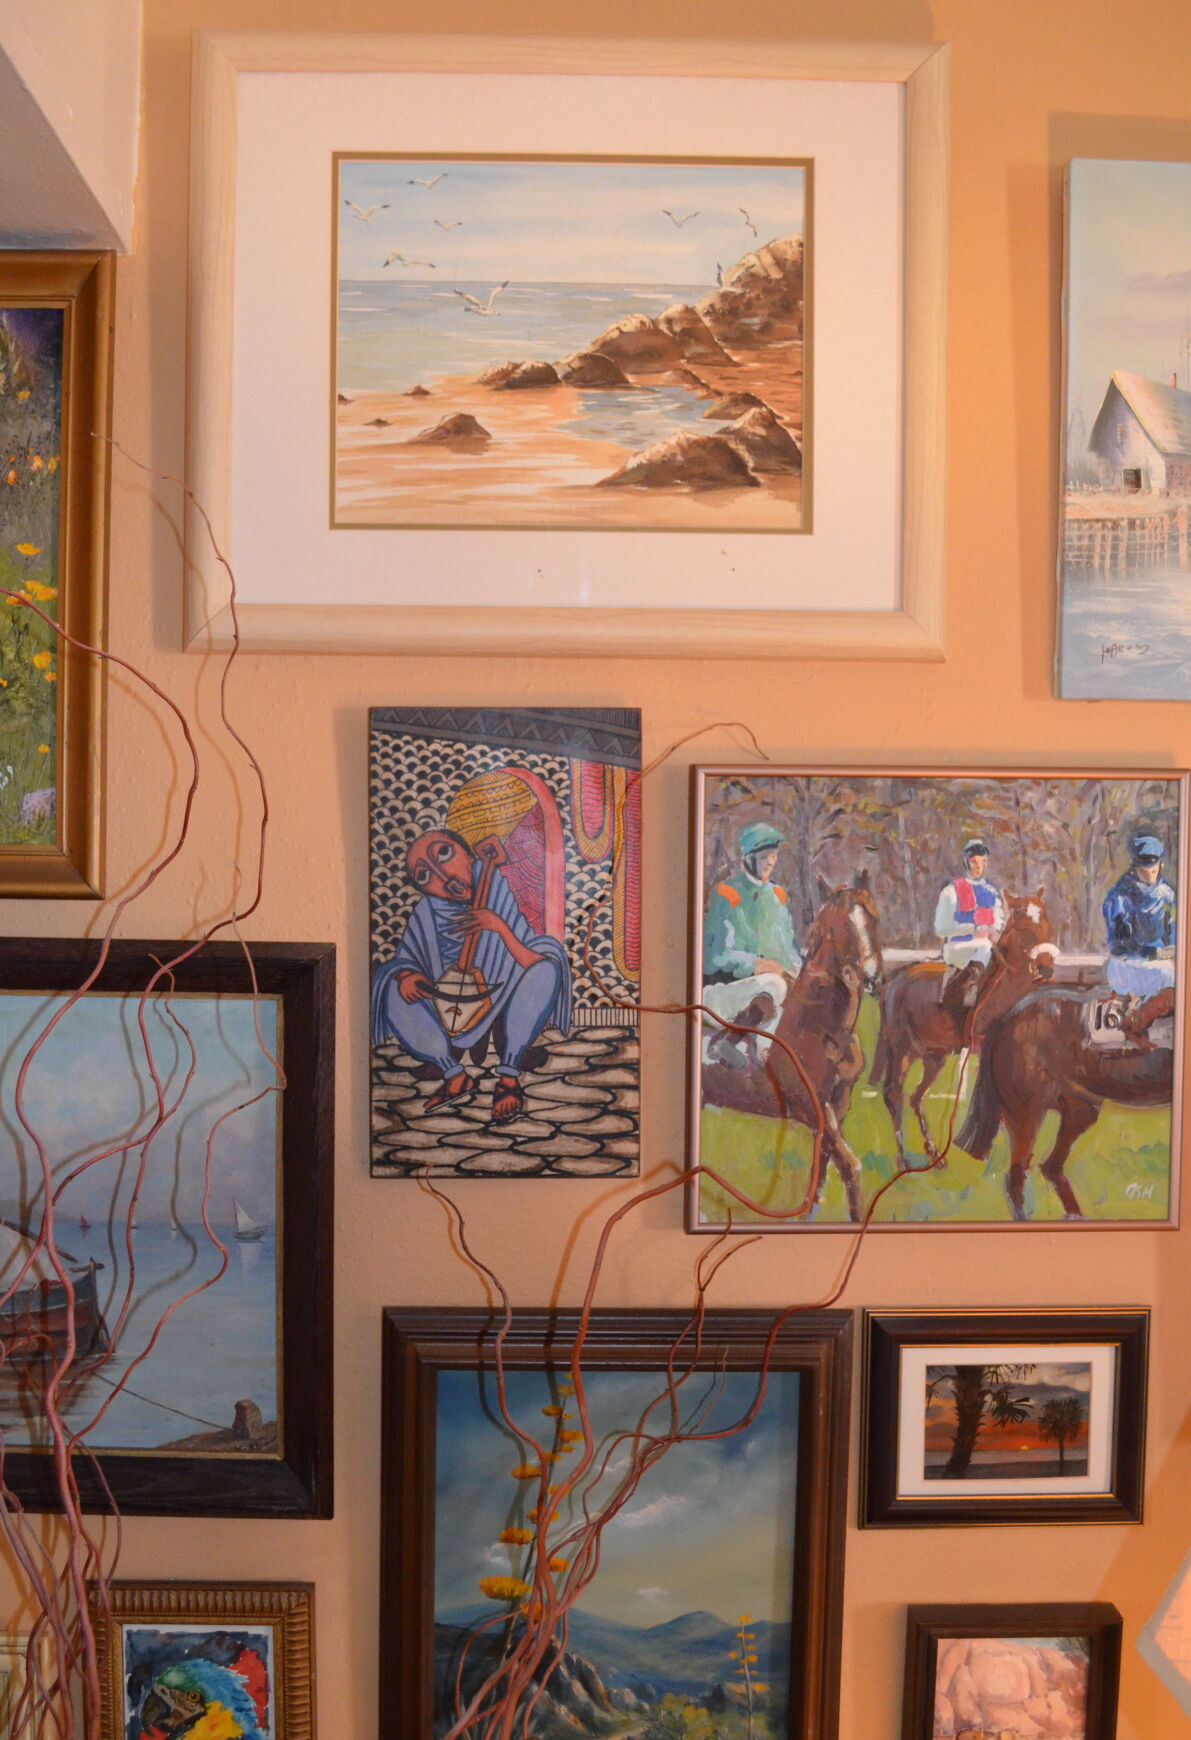 AN ARTISTIC SOUL: Inside a villa's art gallery